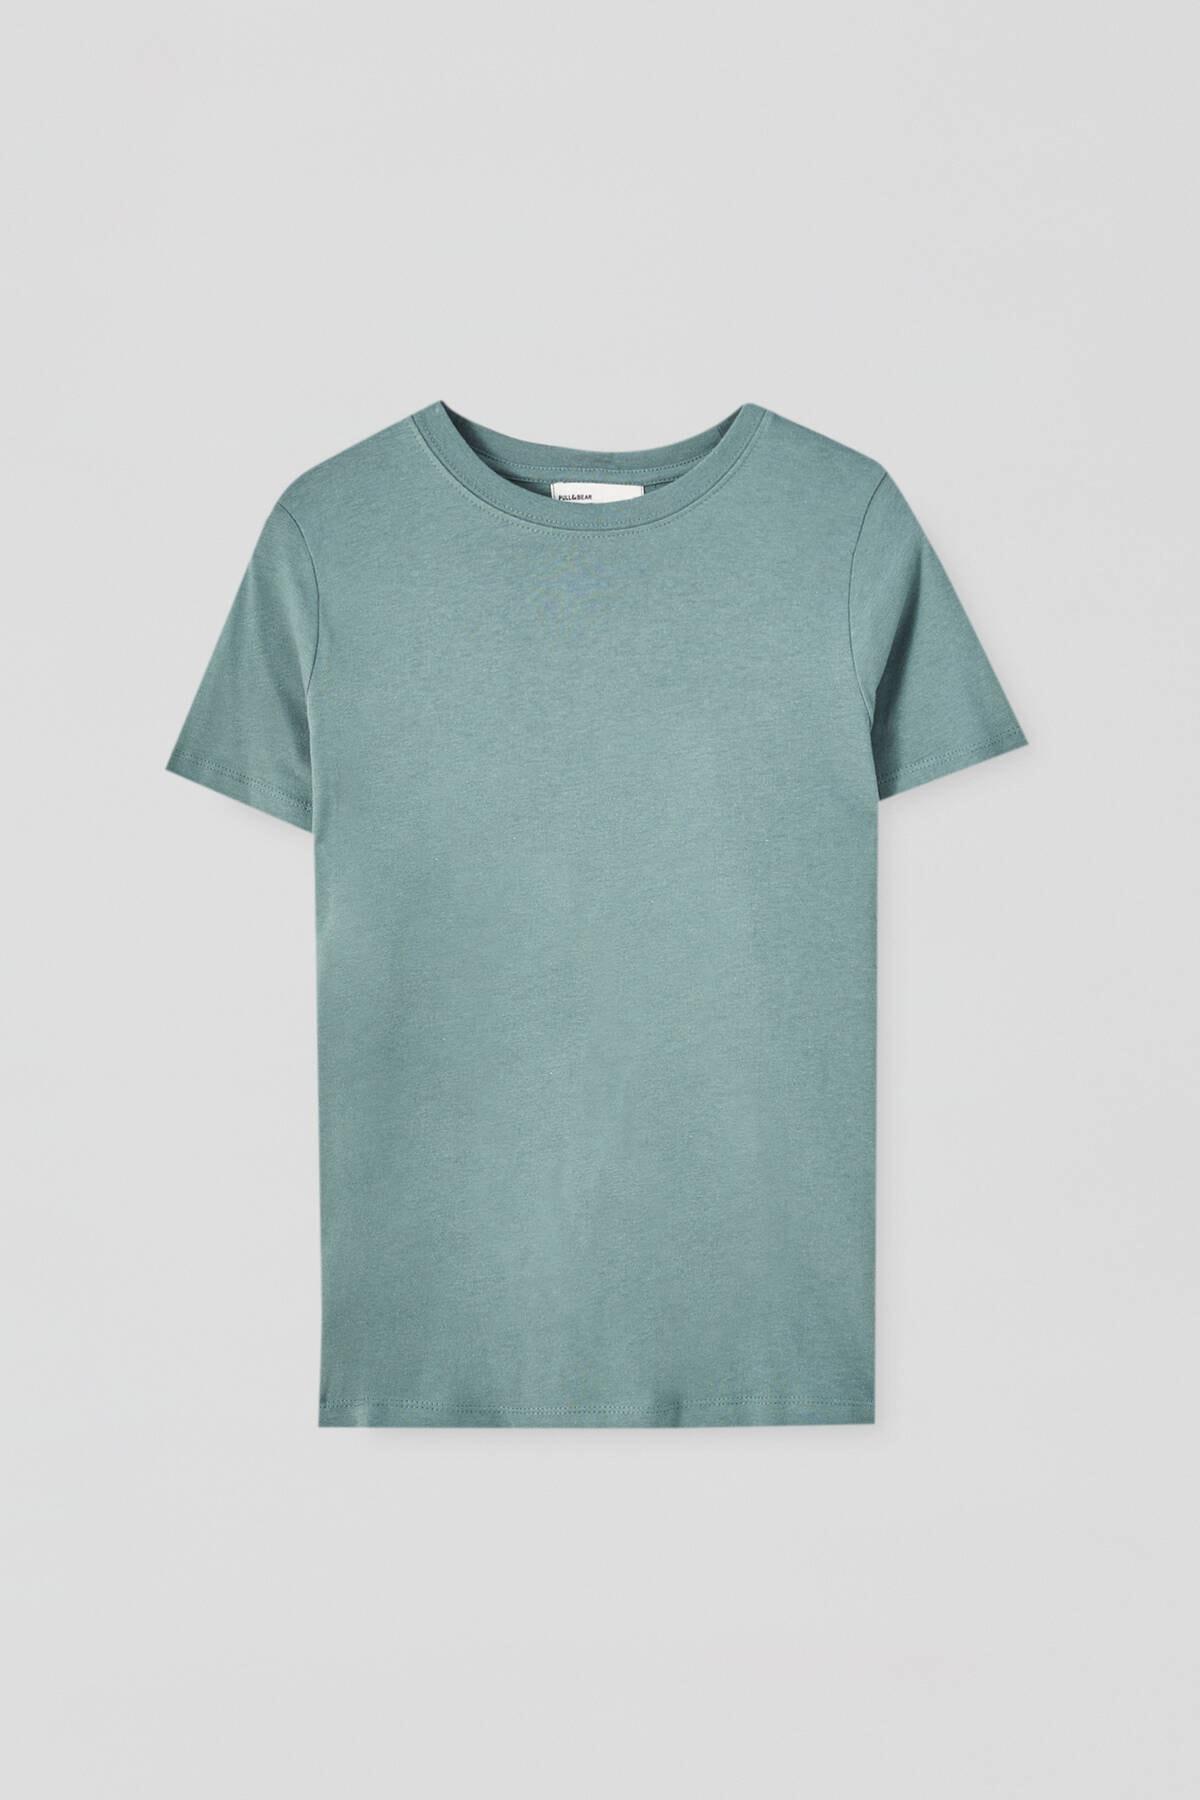 Pull & Bear Kadın Yeşil Basic Bisiklet Yaka T-Shirt 05244357 4